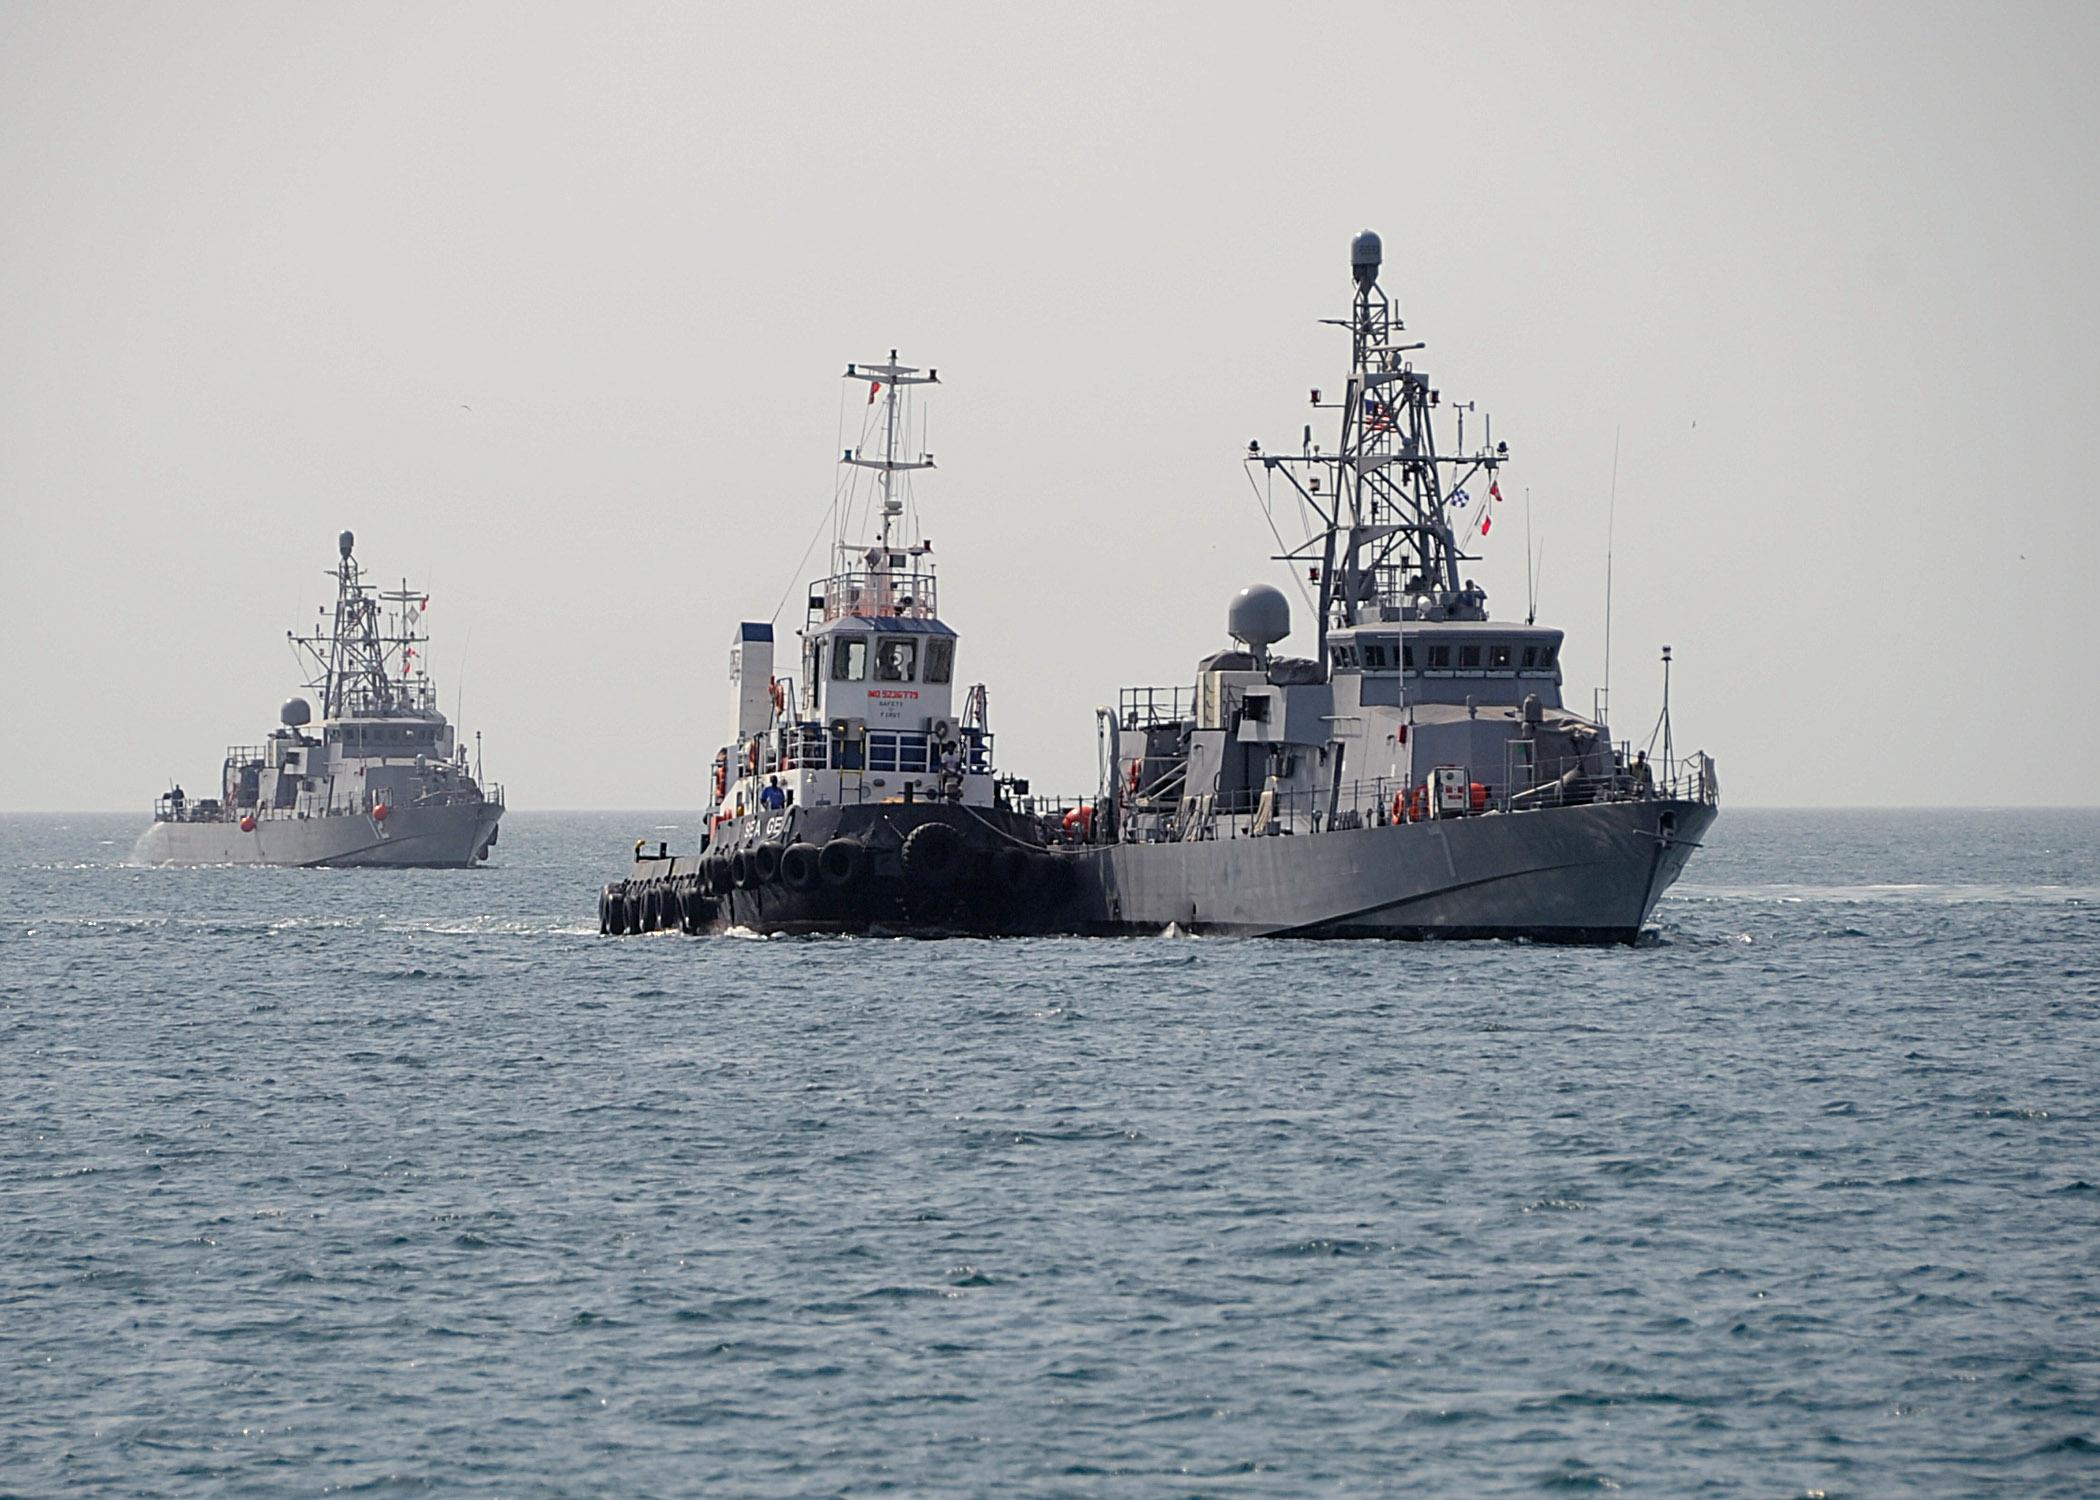 USS THUNDERBOLT PC-12 und USS SQUALL PC-7 am 03.07.2013 in BahrainBild: U.S. Navy